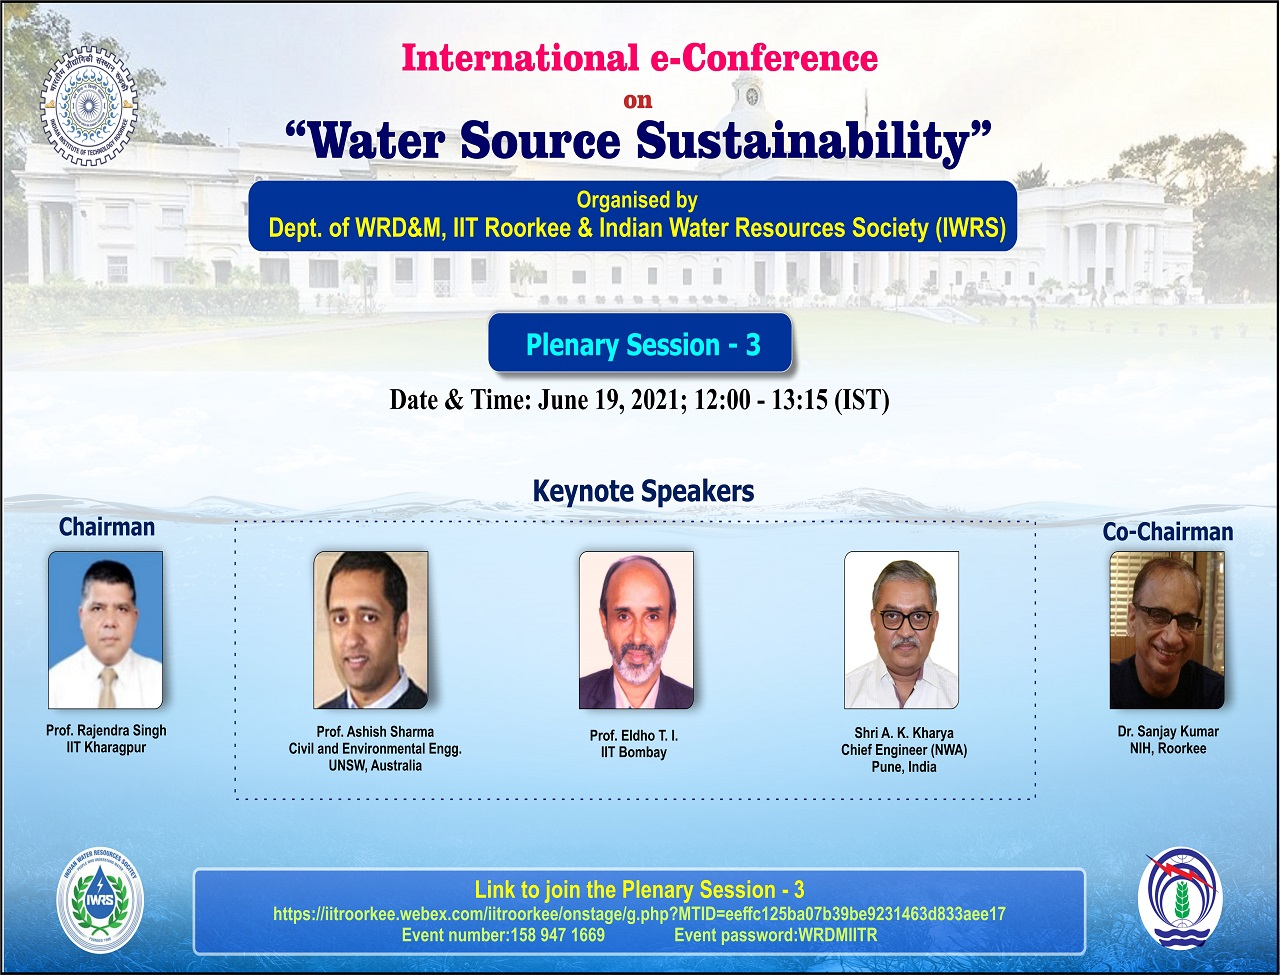 Plenary Session 3